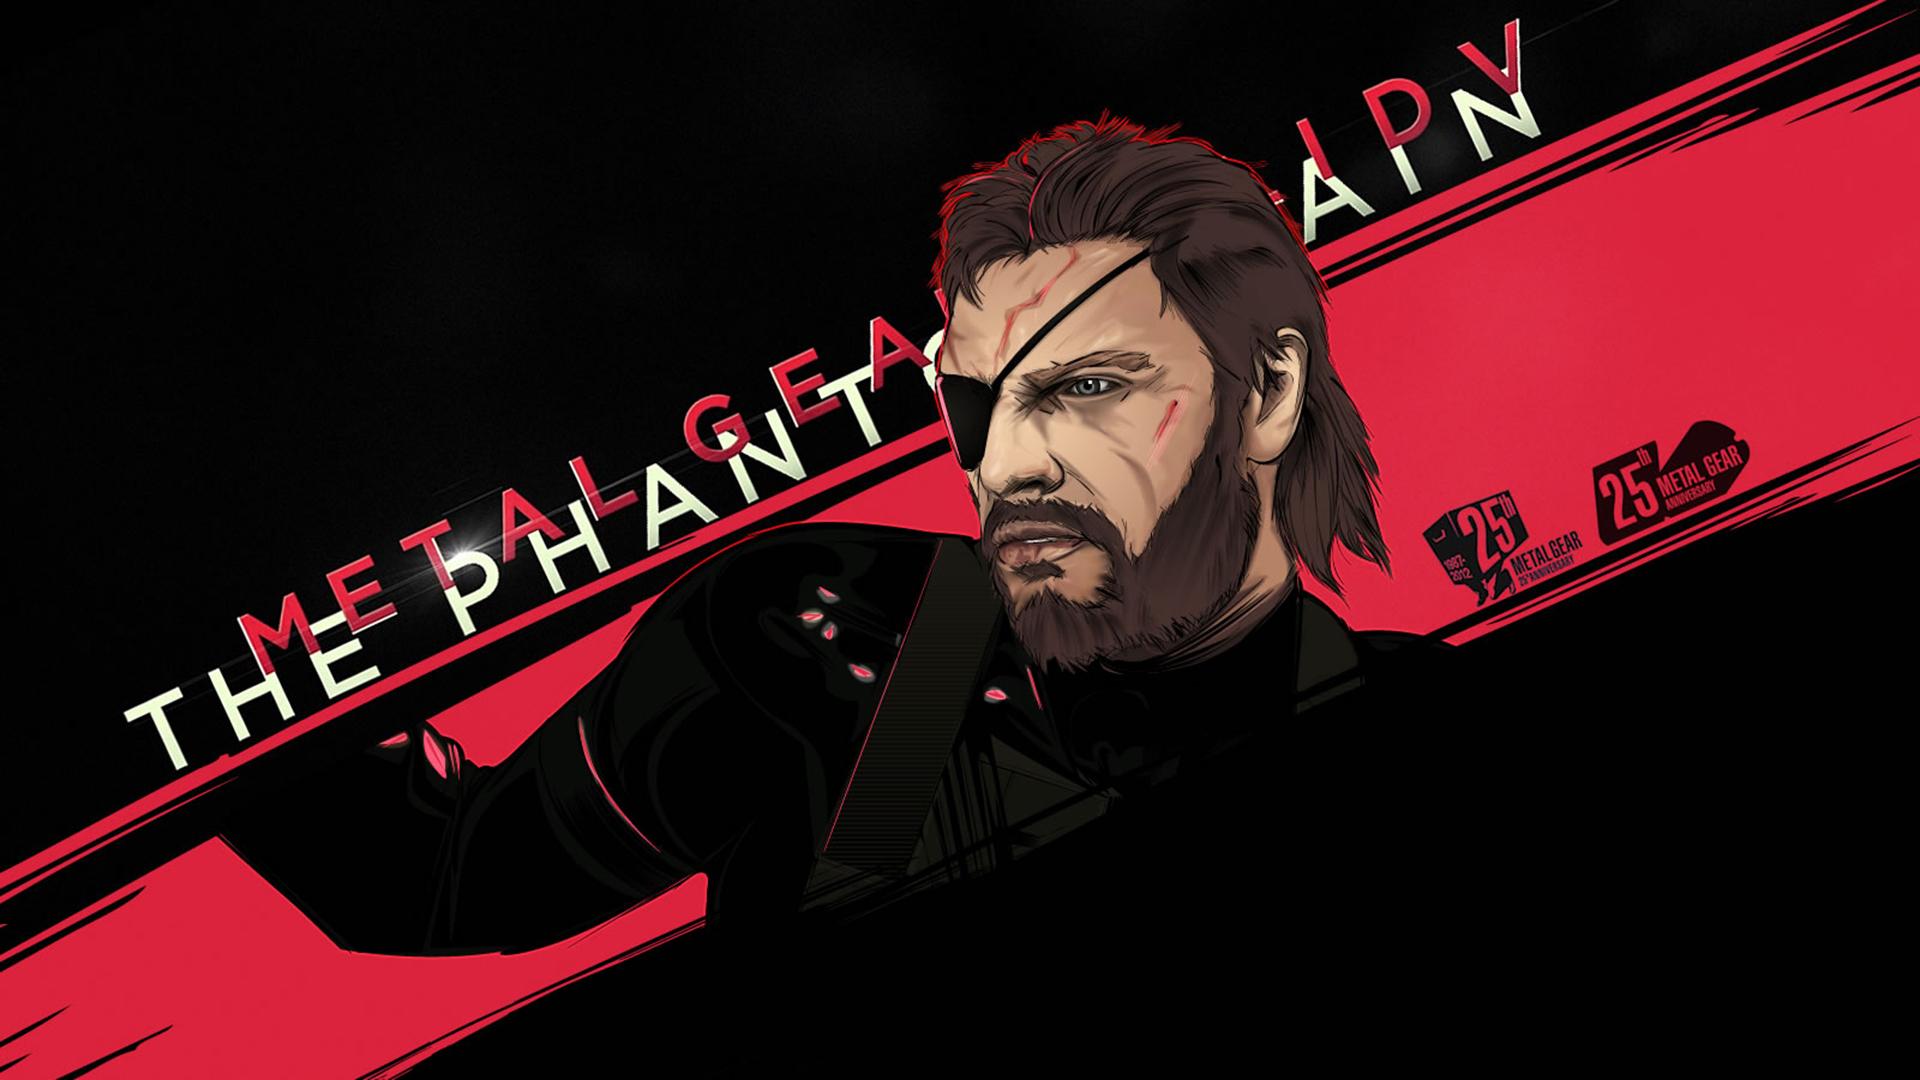 Metal Gear Solid V The Phantom Pain Wallpaper Hd Games 4k